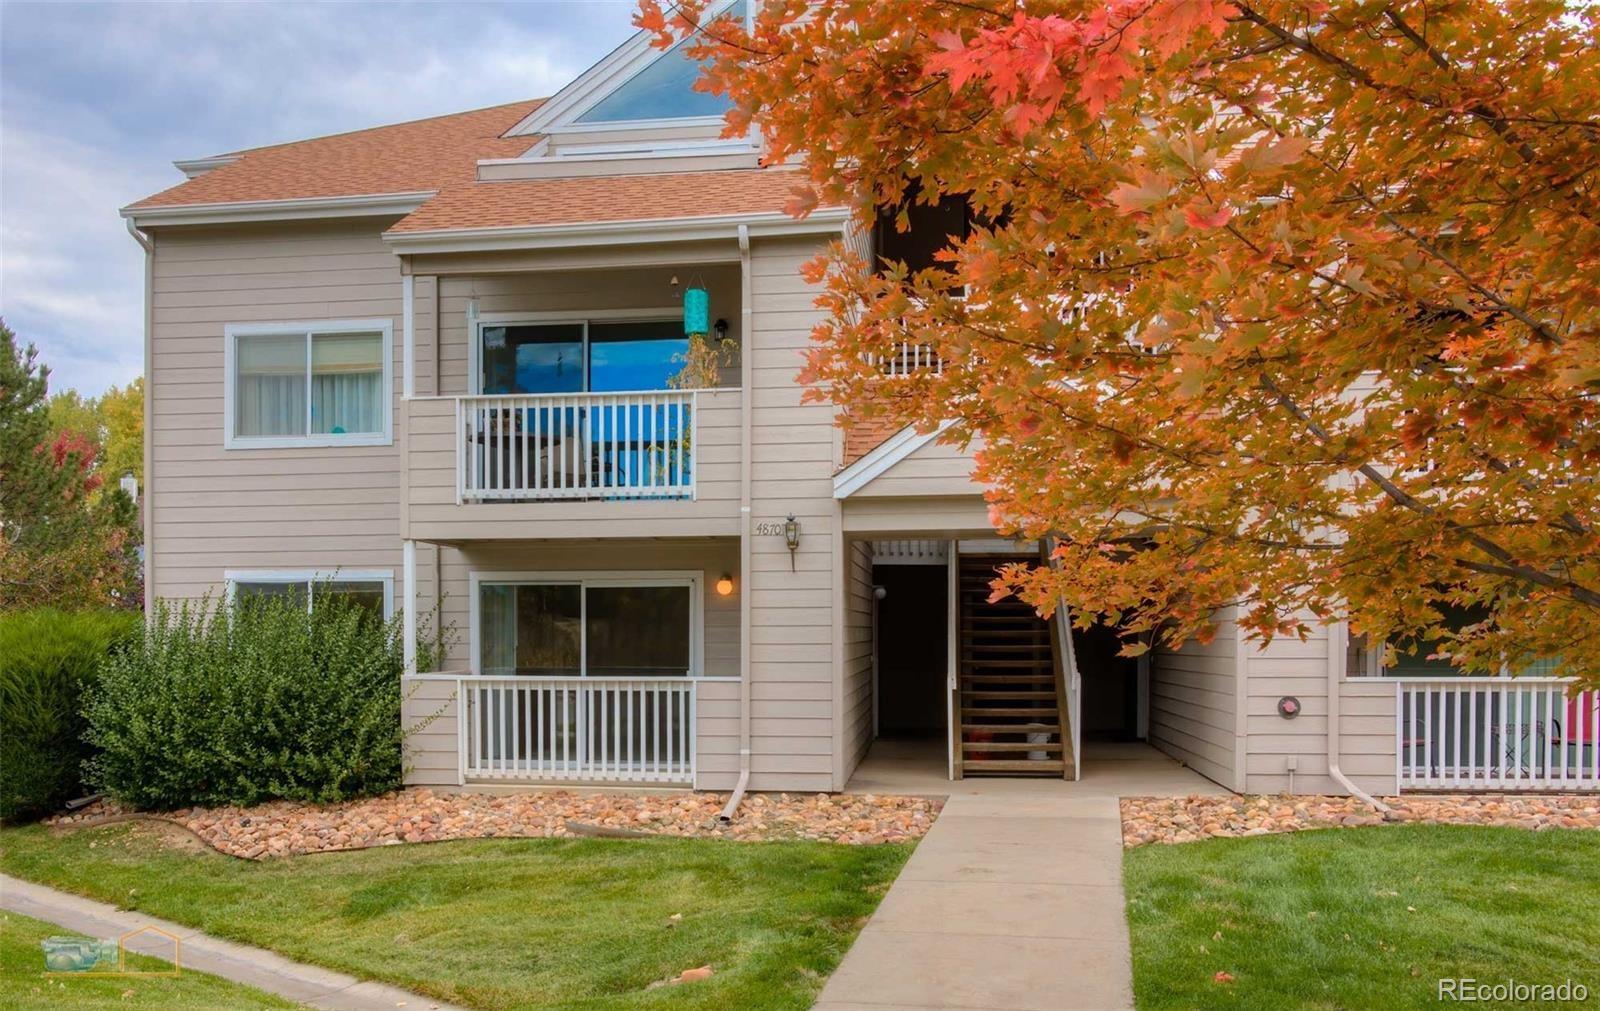 MLS# 6046314 - 3 - 4870 Twin Lakes Road #8, Boulder, CO 80301